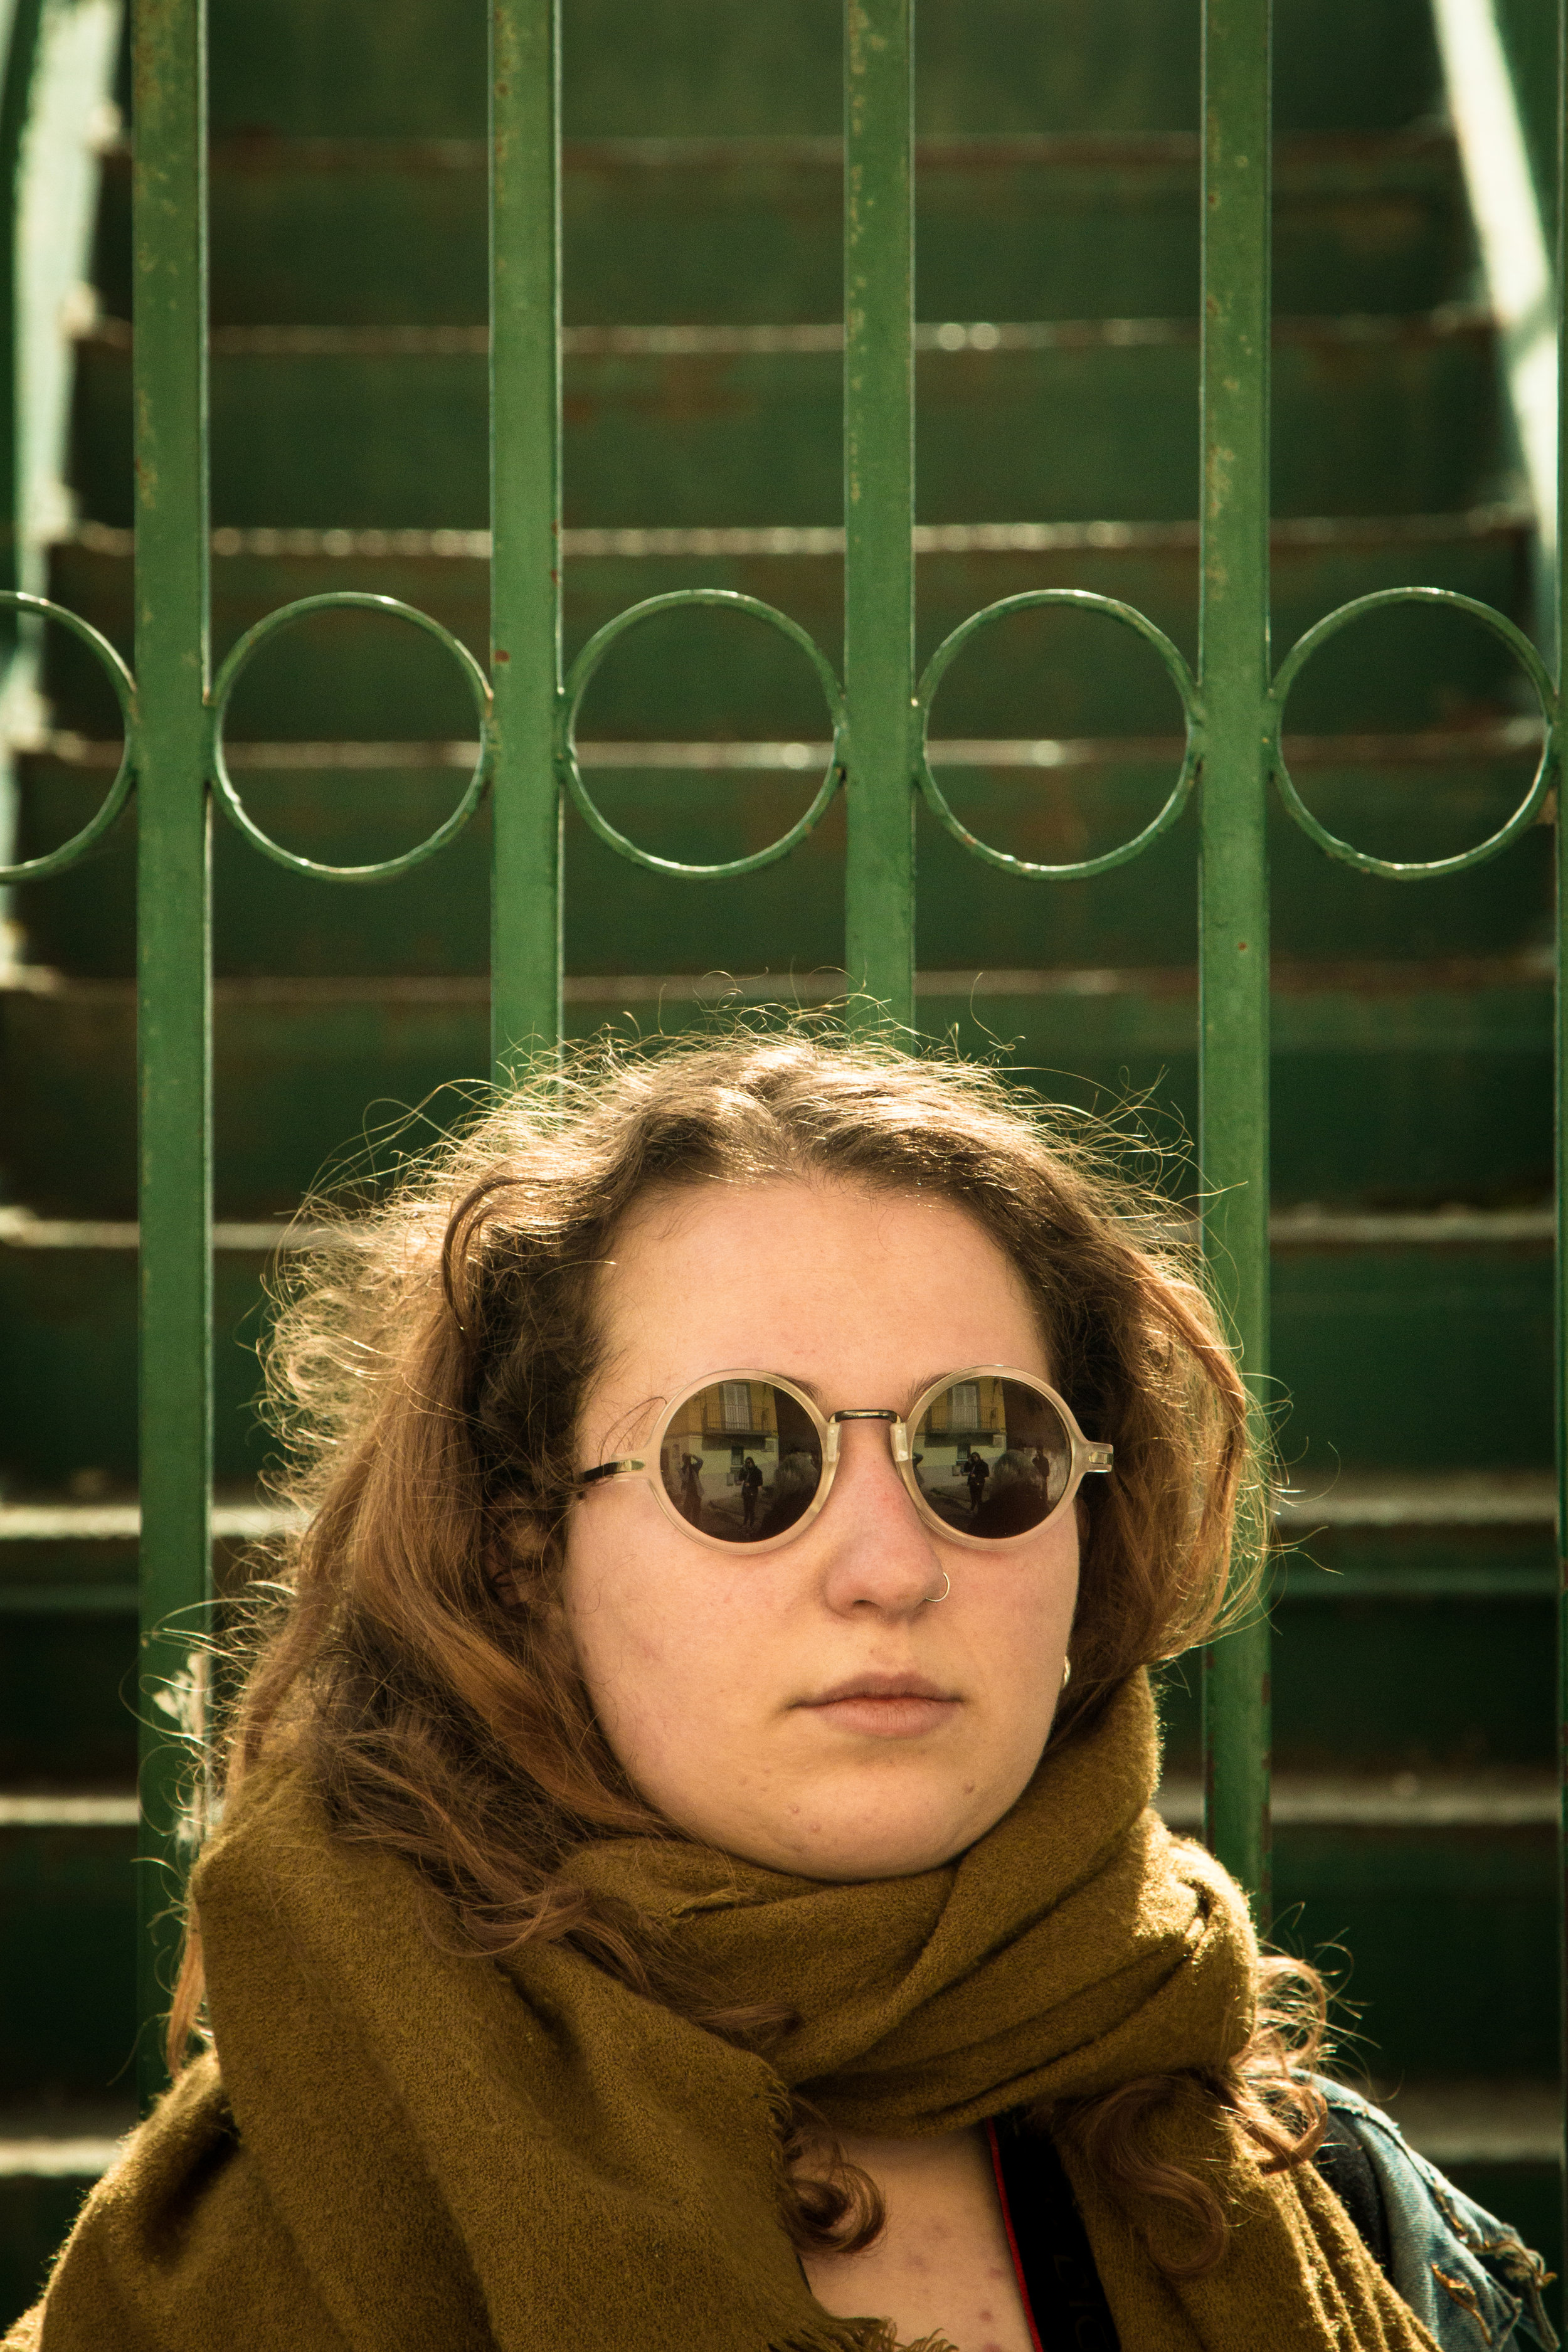 kira sunglasses.jpg